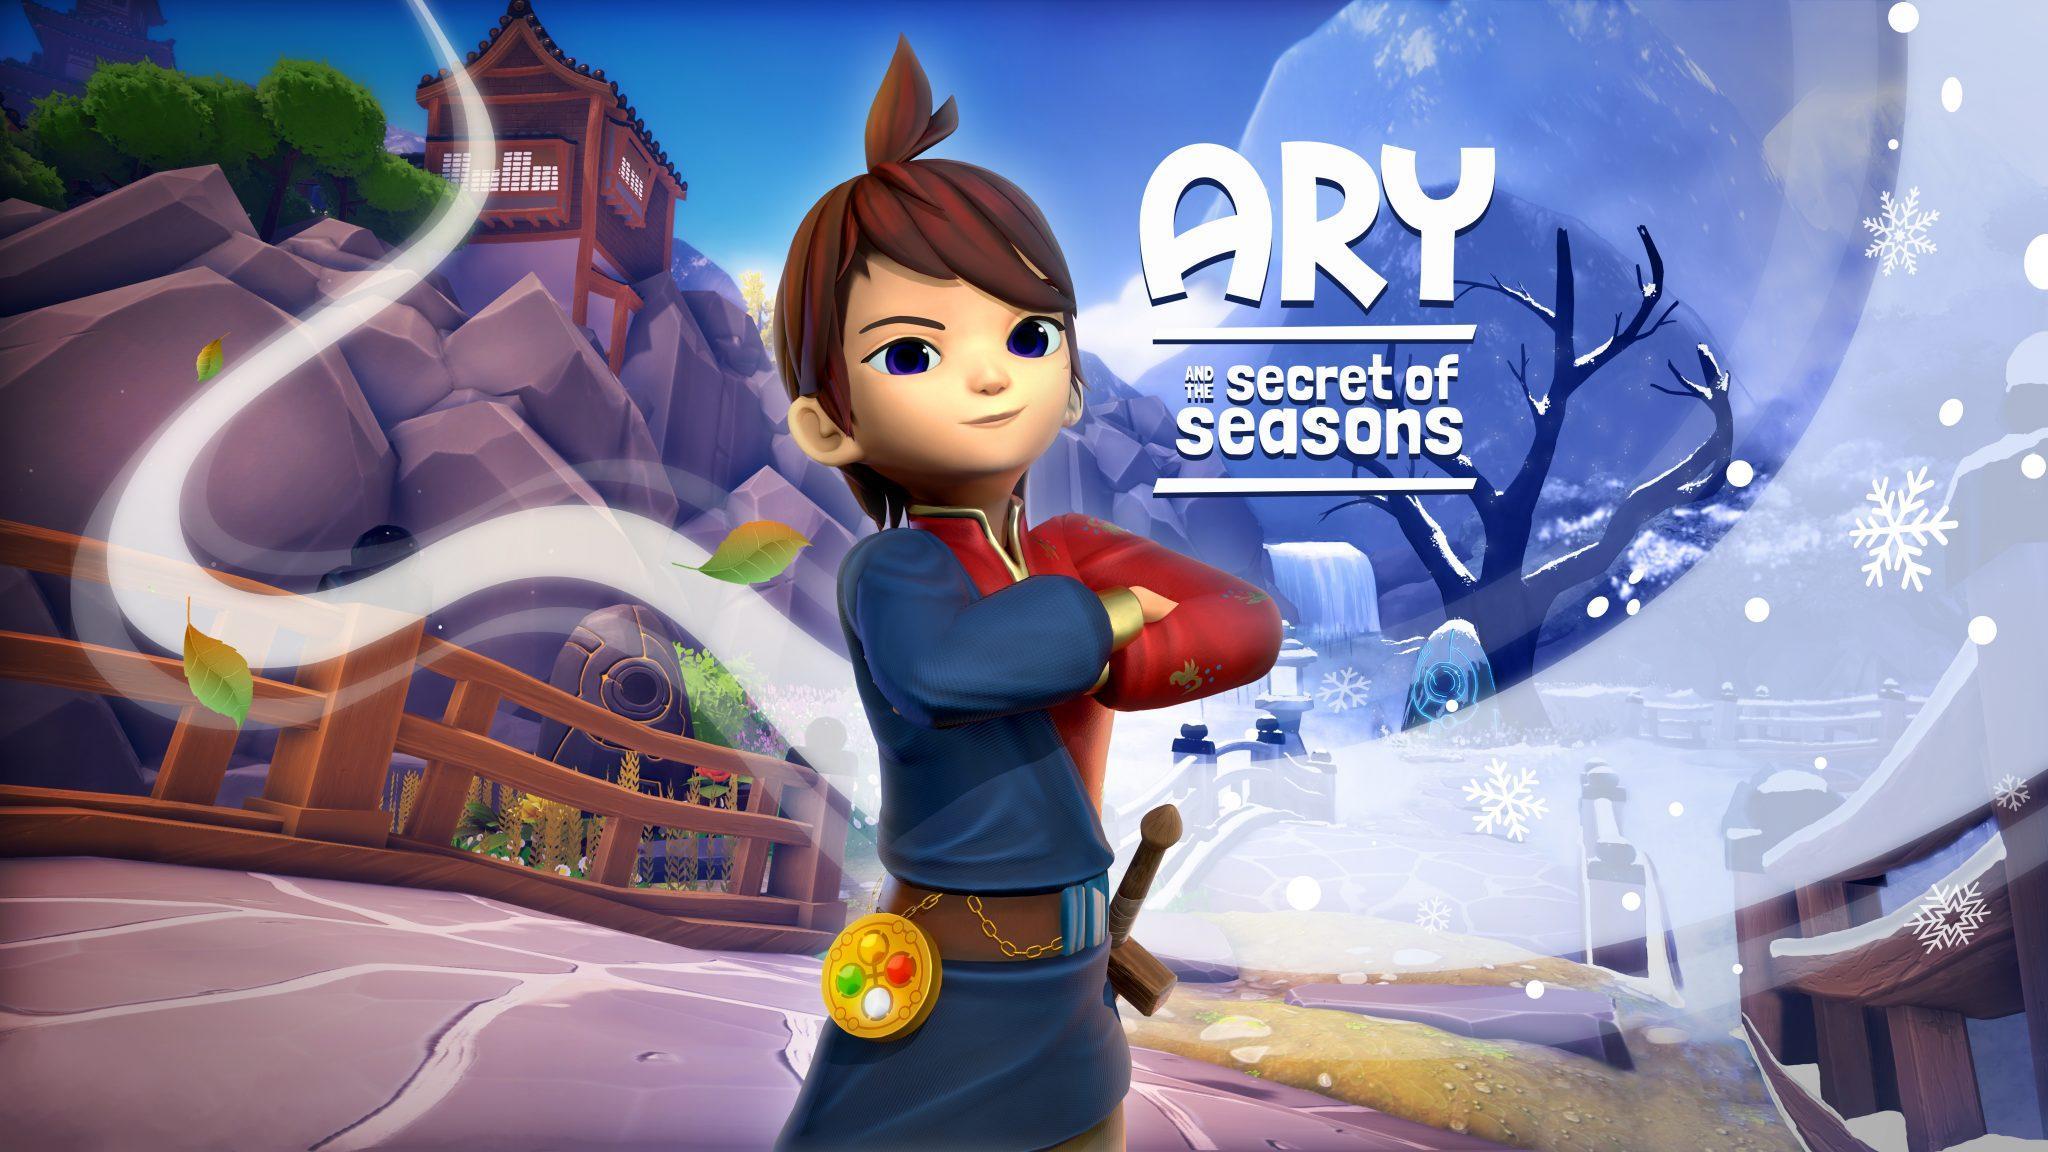 Ary and the Secret of Seasons - новое видео с прохождением от разработчиков 98